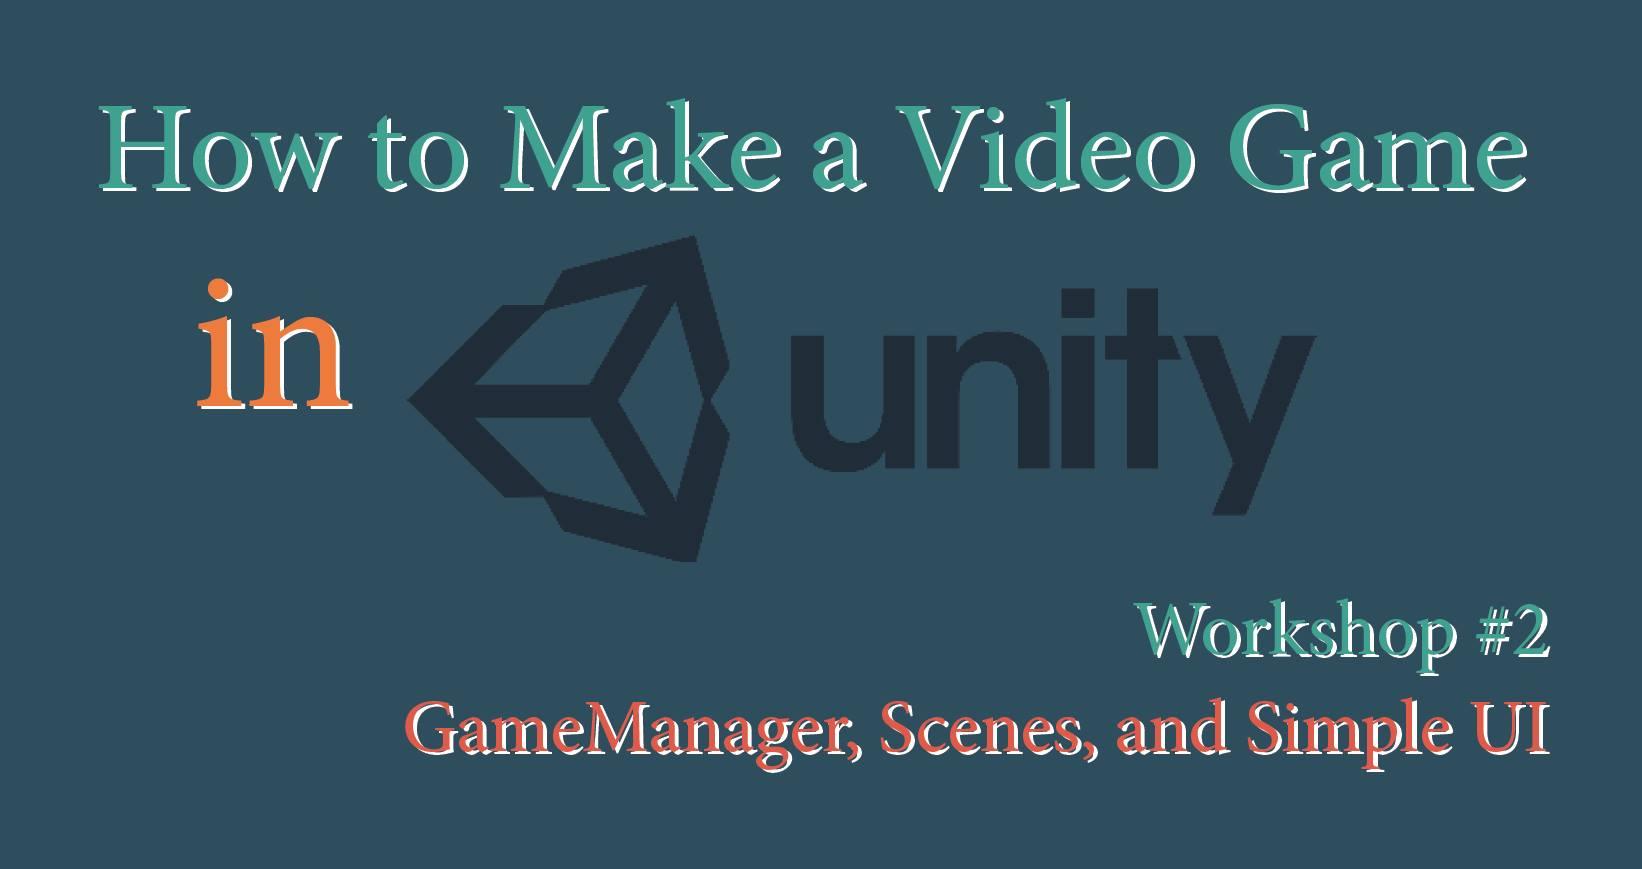 Workshop: UI, Scenes, and GameManager